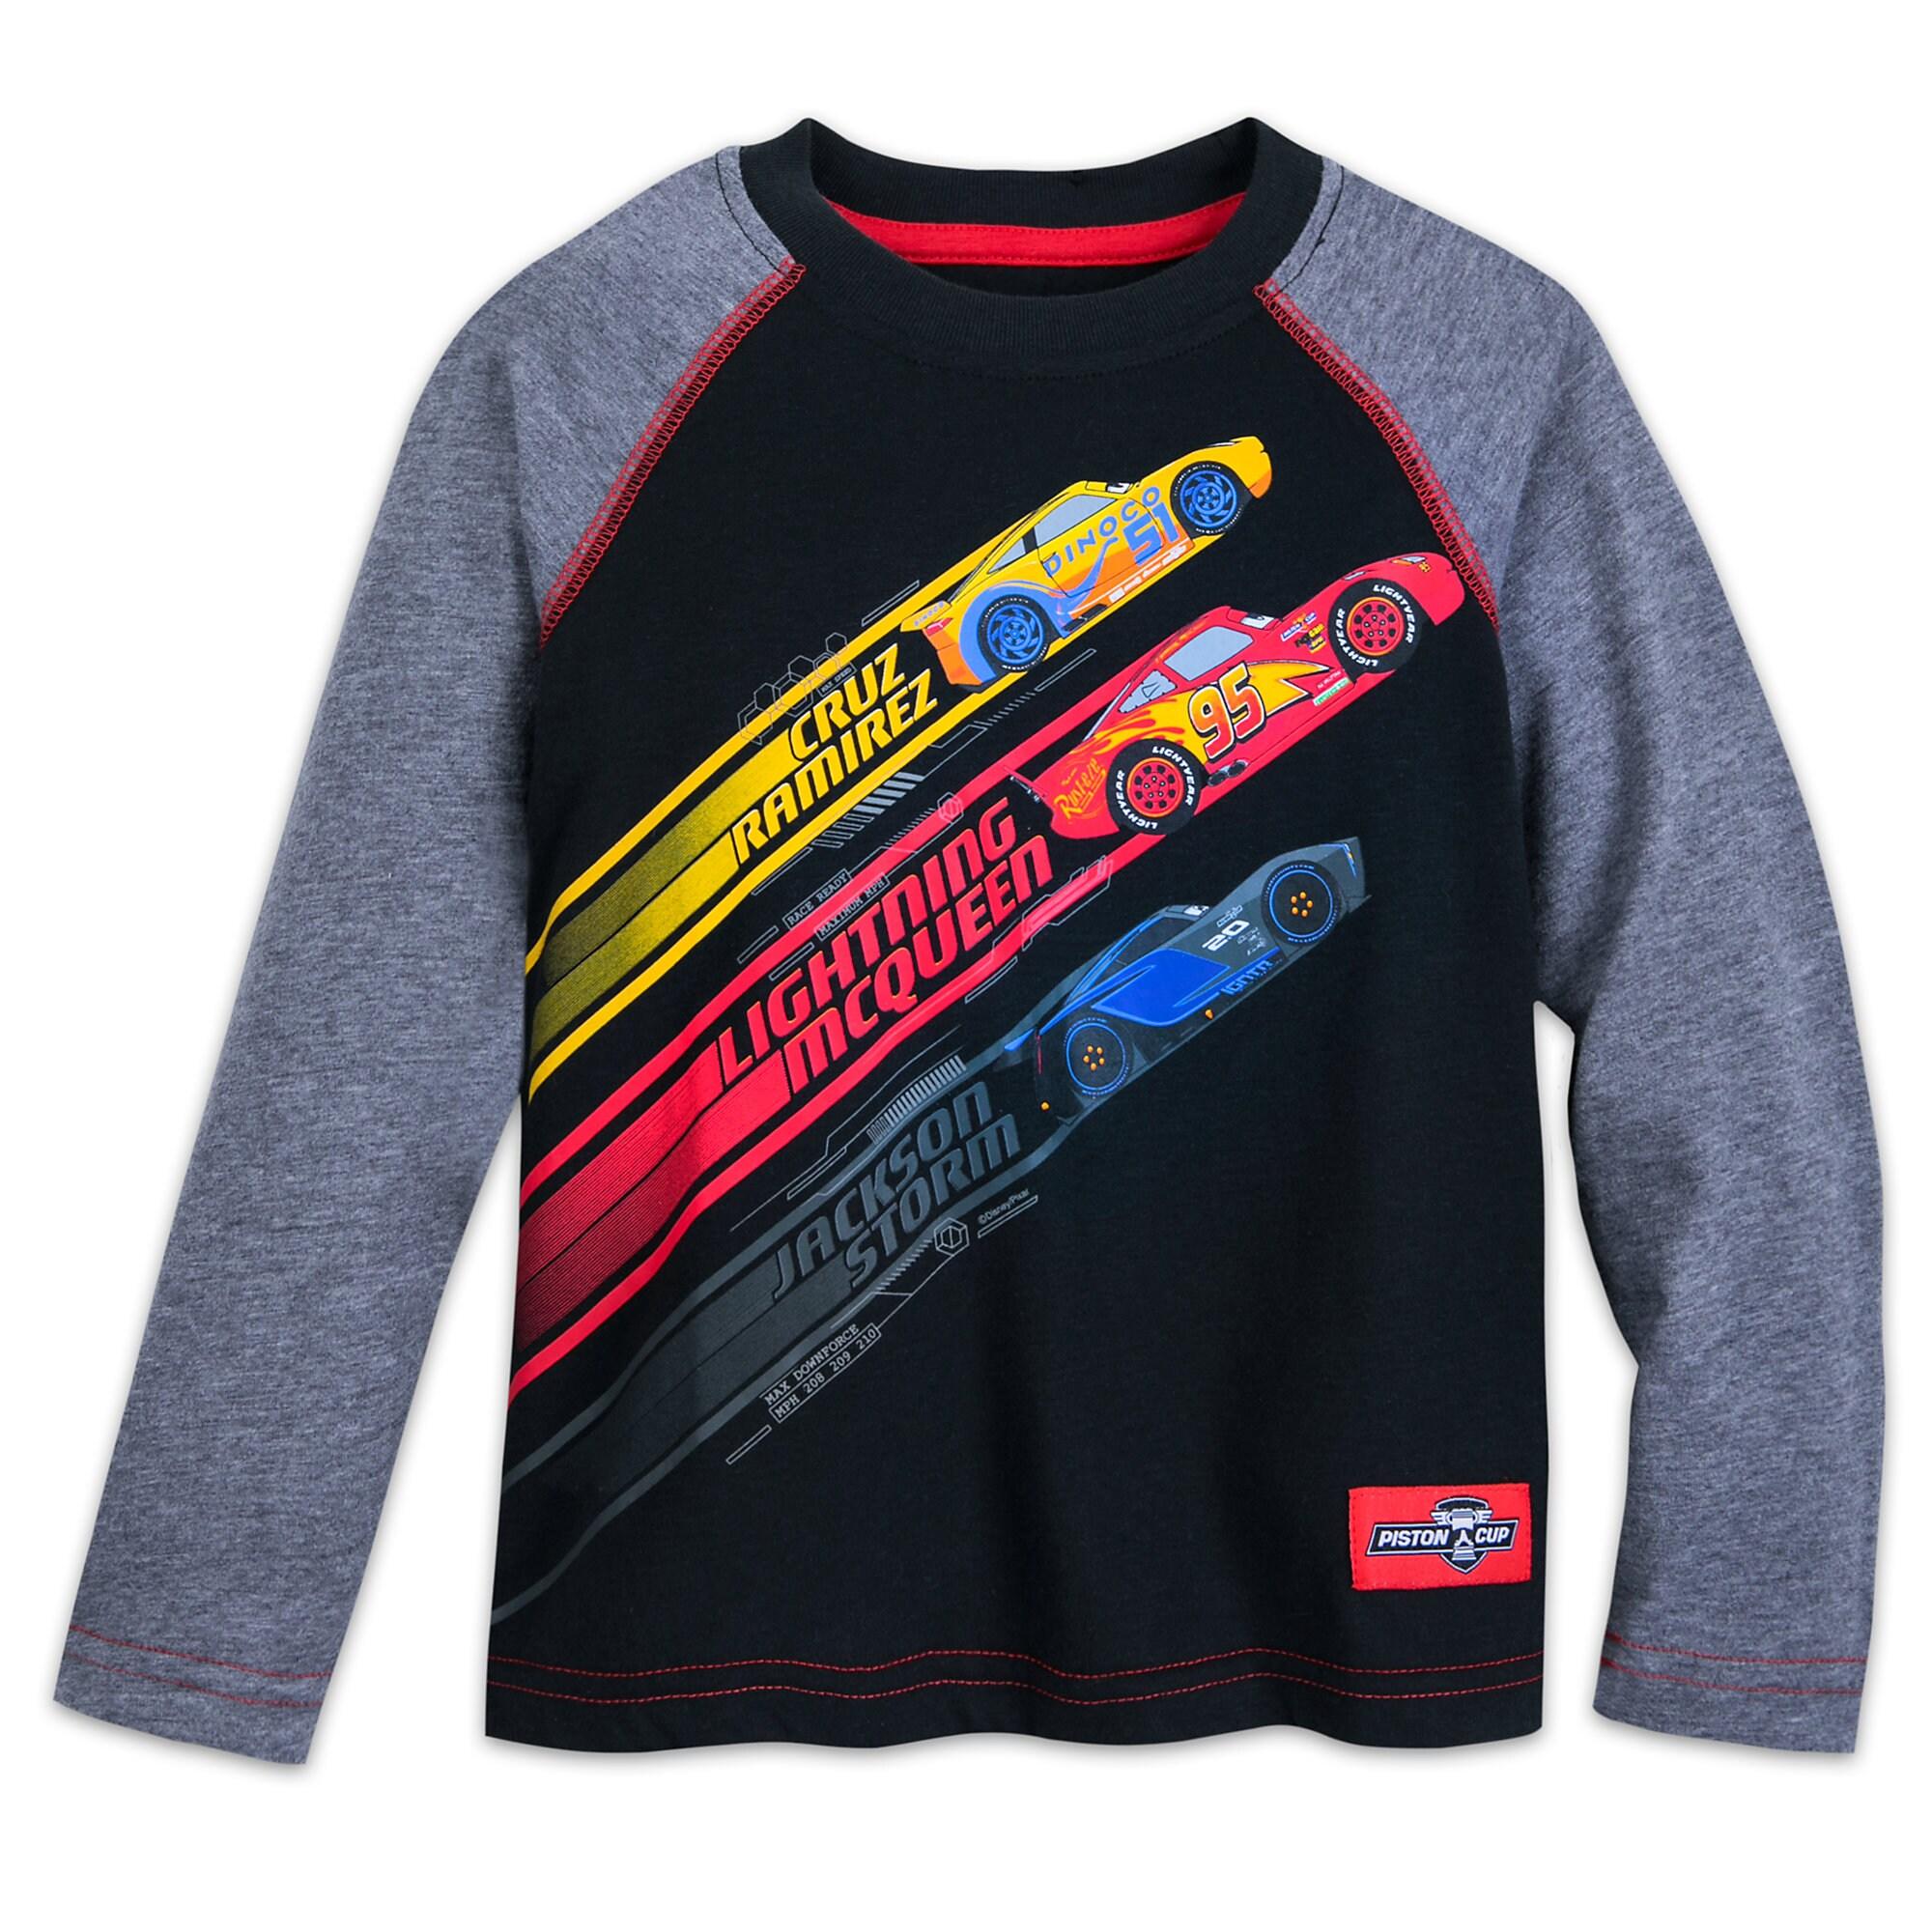 online store 9a5c9 db19b Space Jam Long Sleeve Shirt Walmart | RLDM